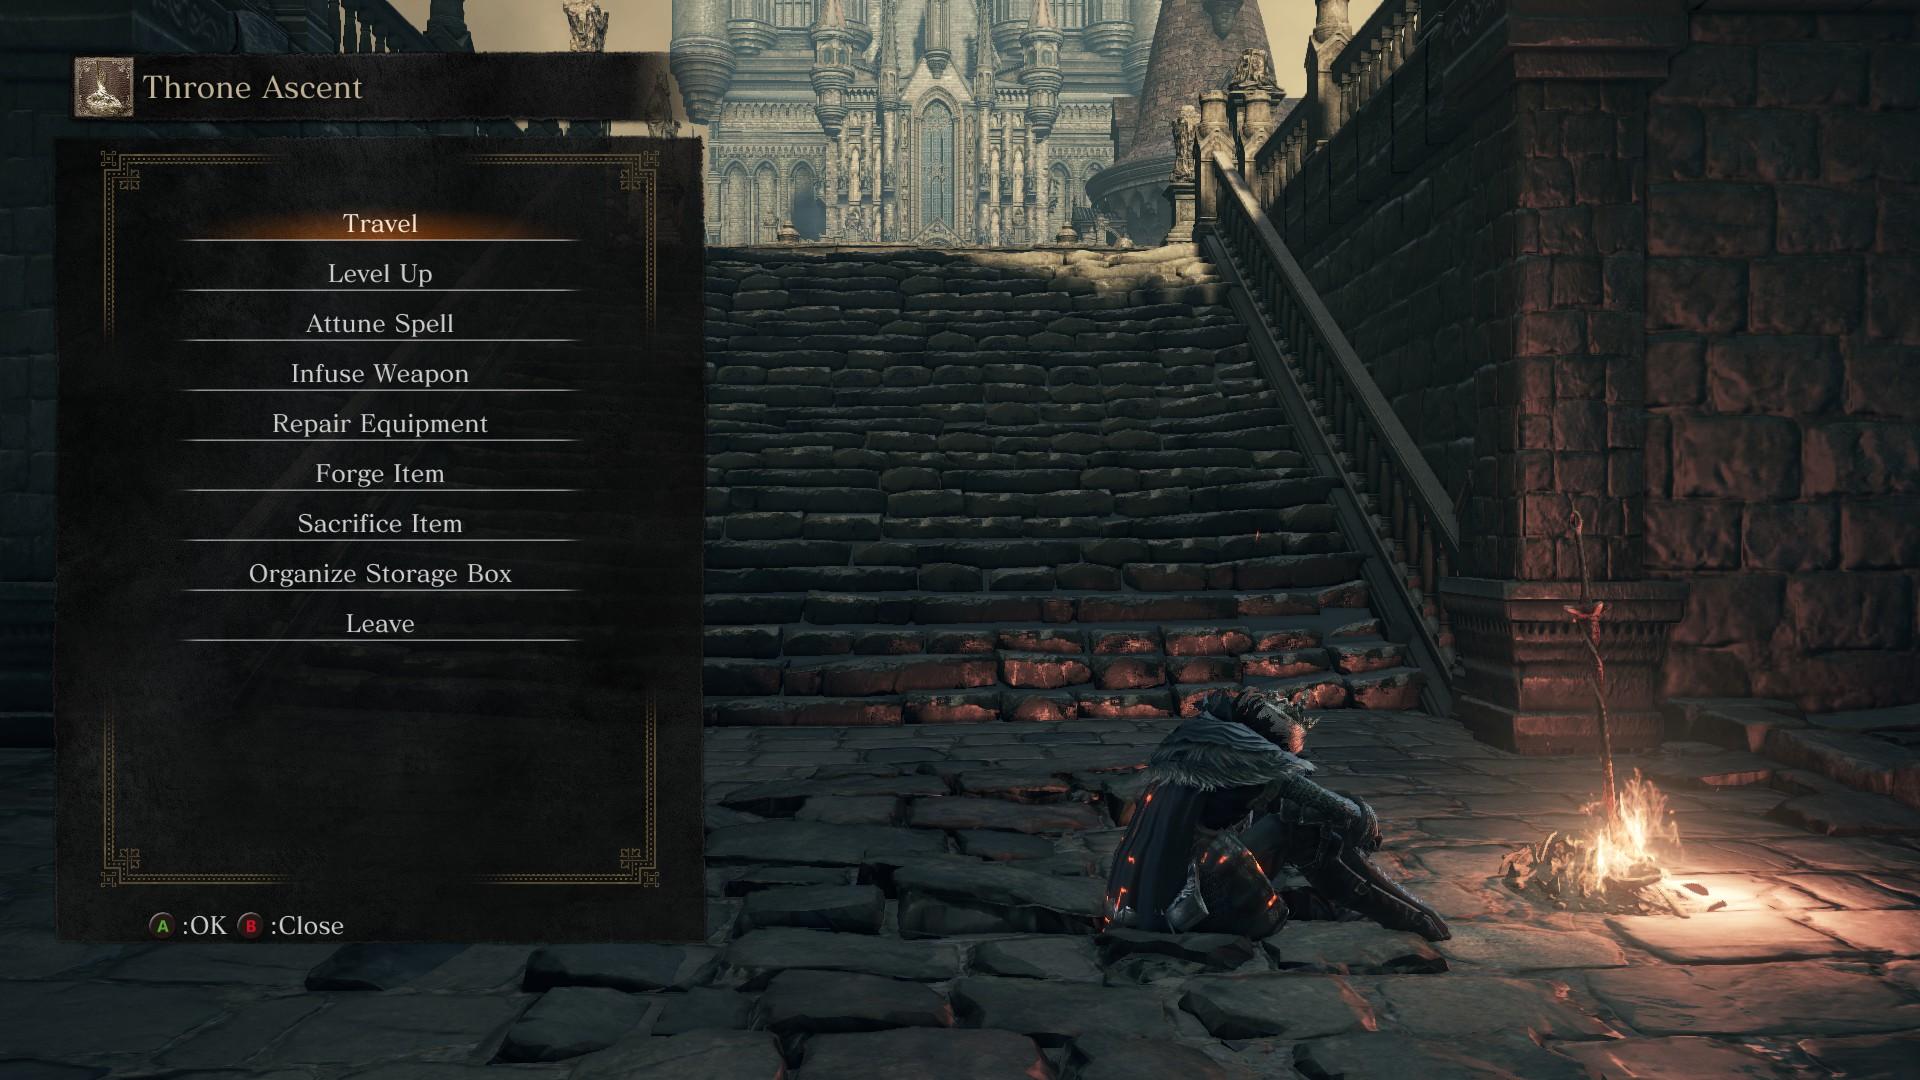 Throne_Ascent.jpg